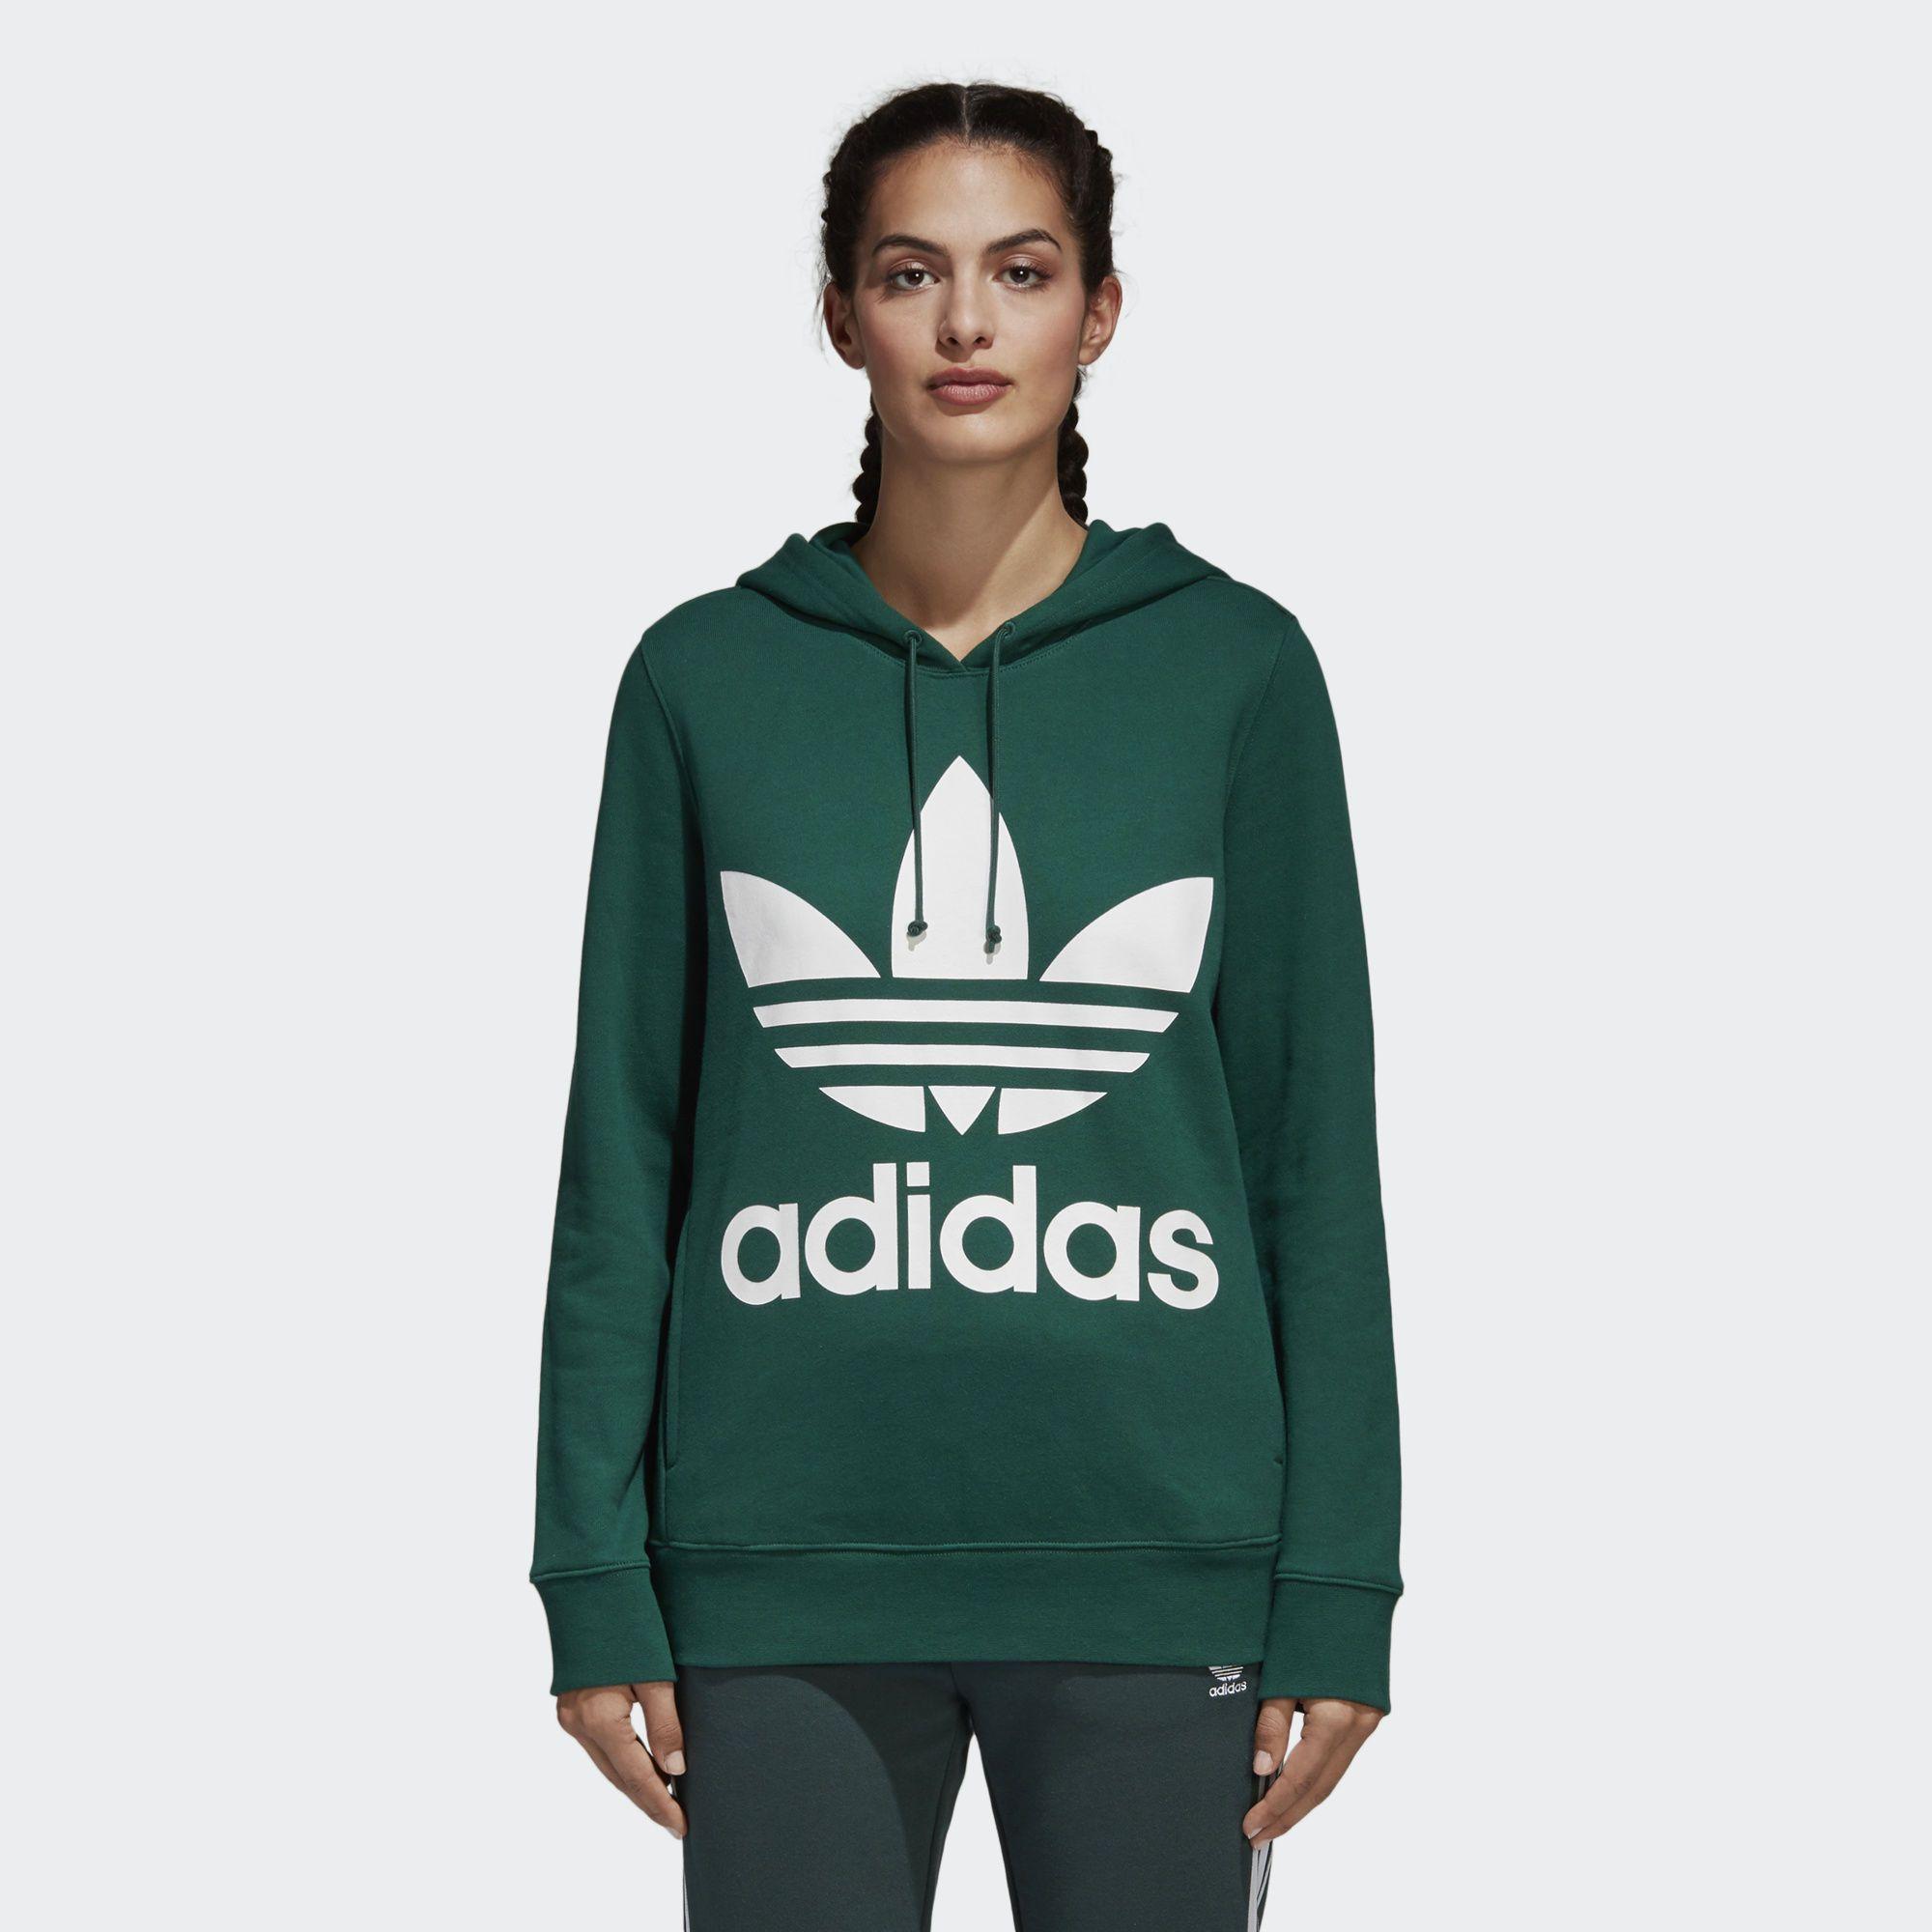 adidas Originals Kapuzenpullover Hoodie Oversized Trefoil Hoodie Damen Frauen